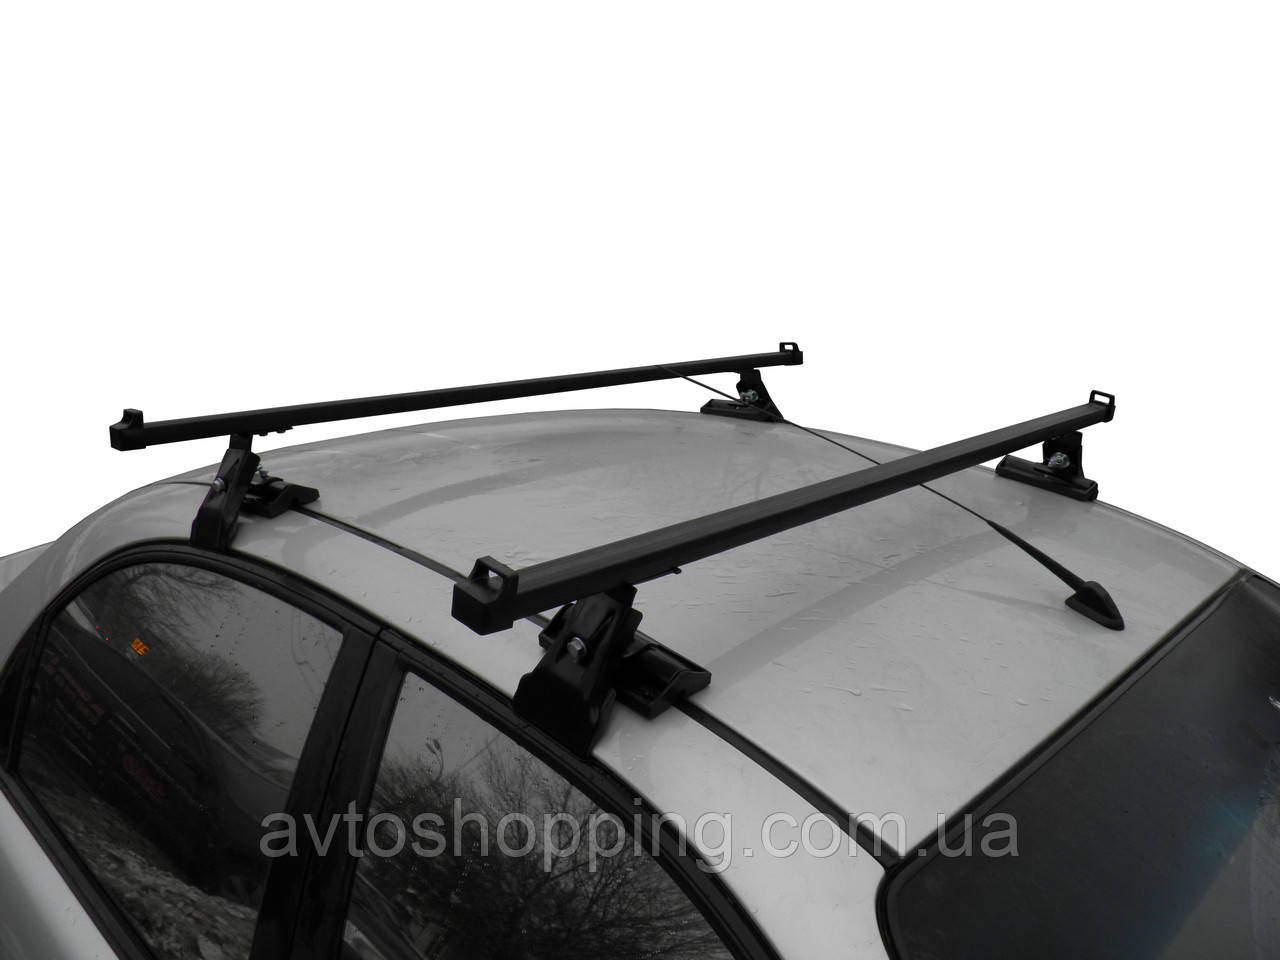 Багажник на дах CAMEL для авто з гладкою дахом Черато, Ланос, Лачетті, Акцент, Авео, Лансер,